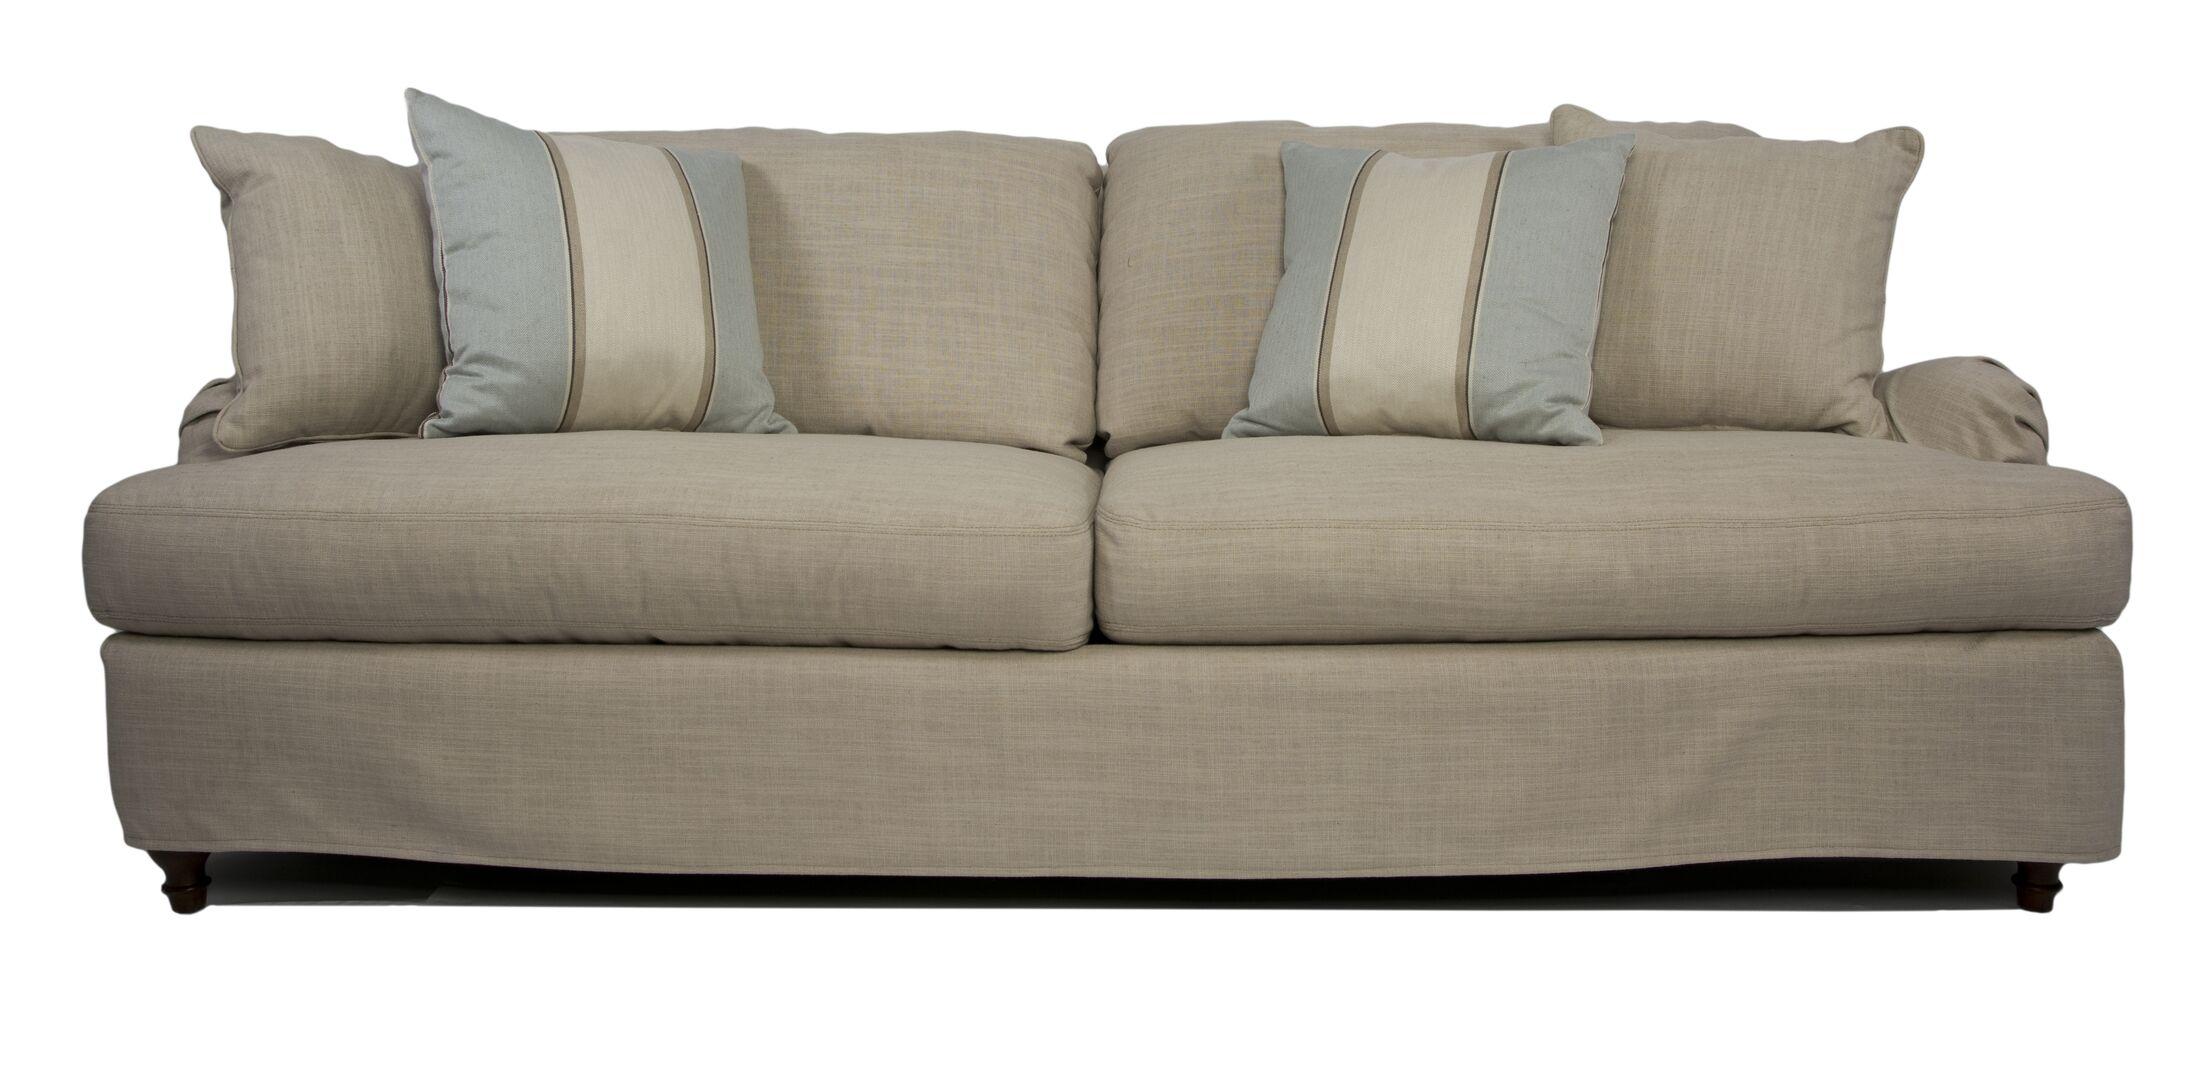 Seacoast T-Cushion Sofa Slipcover Set